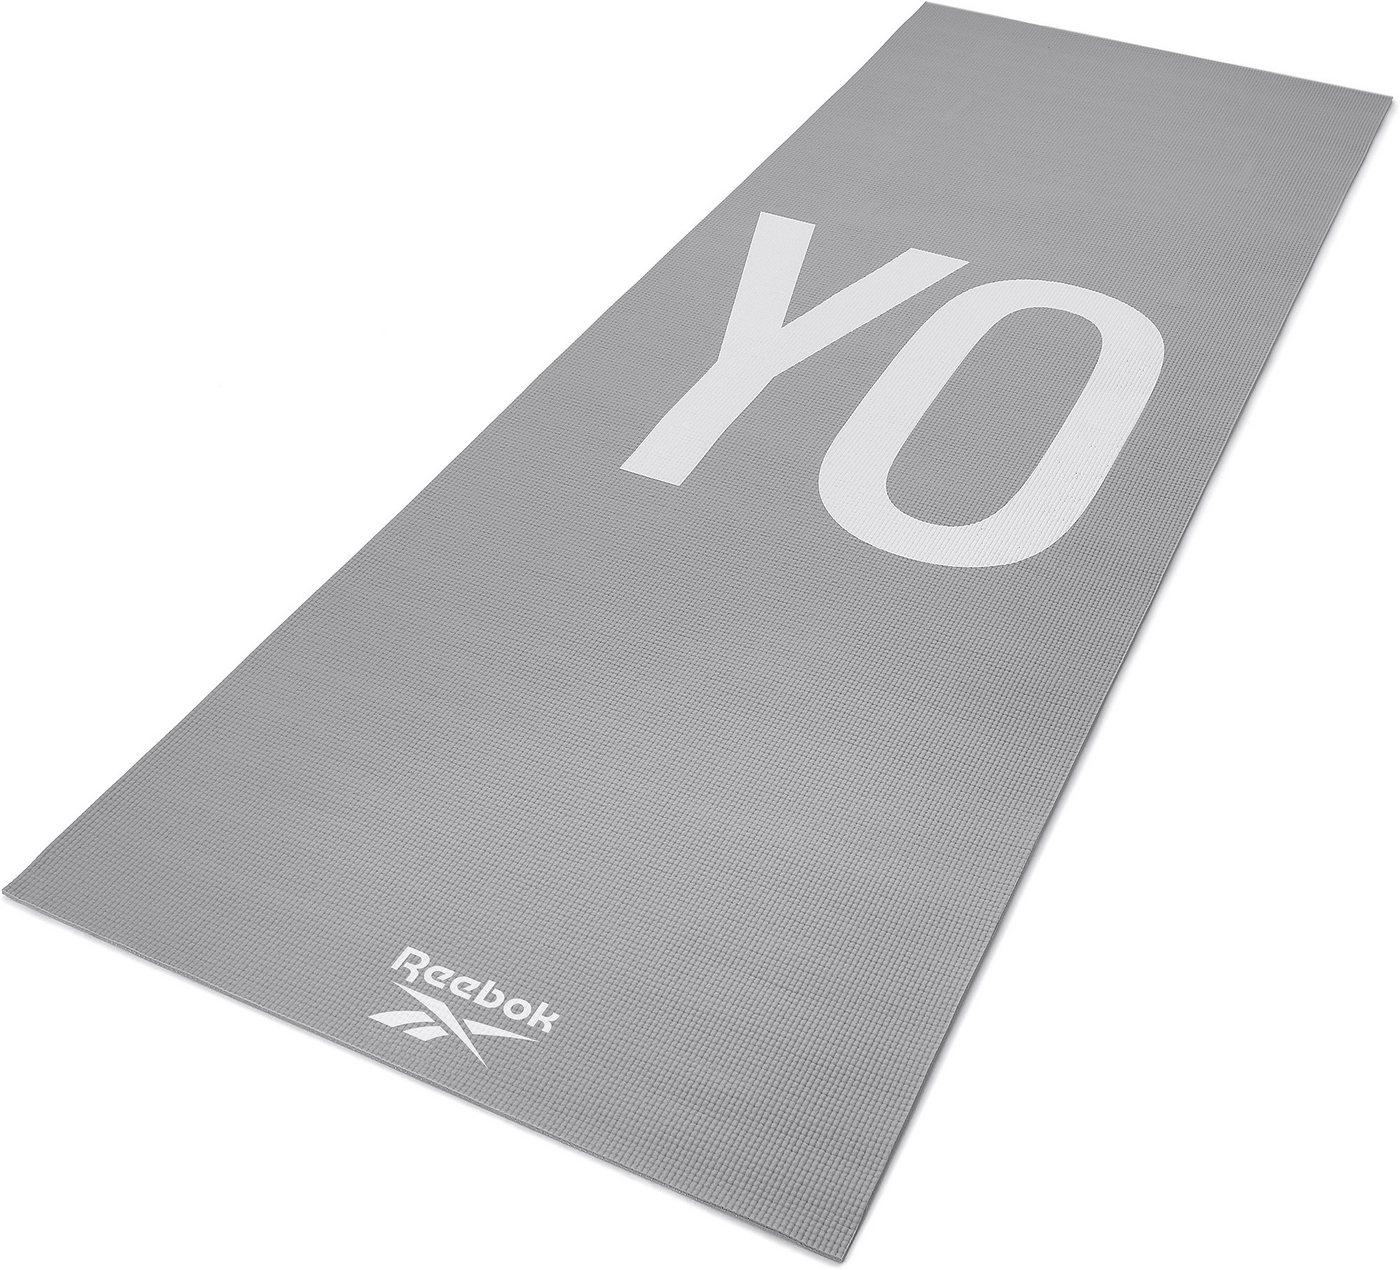 Reebok Yogamatte »Reebok Yogamatte